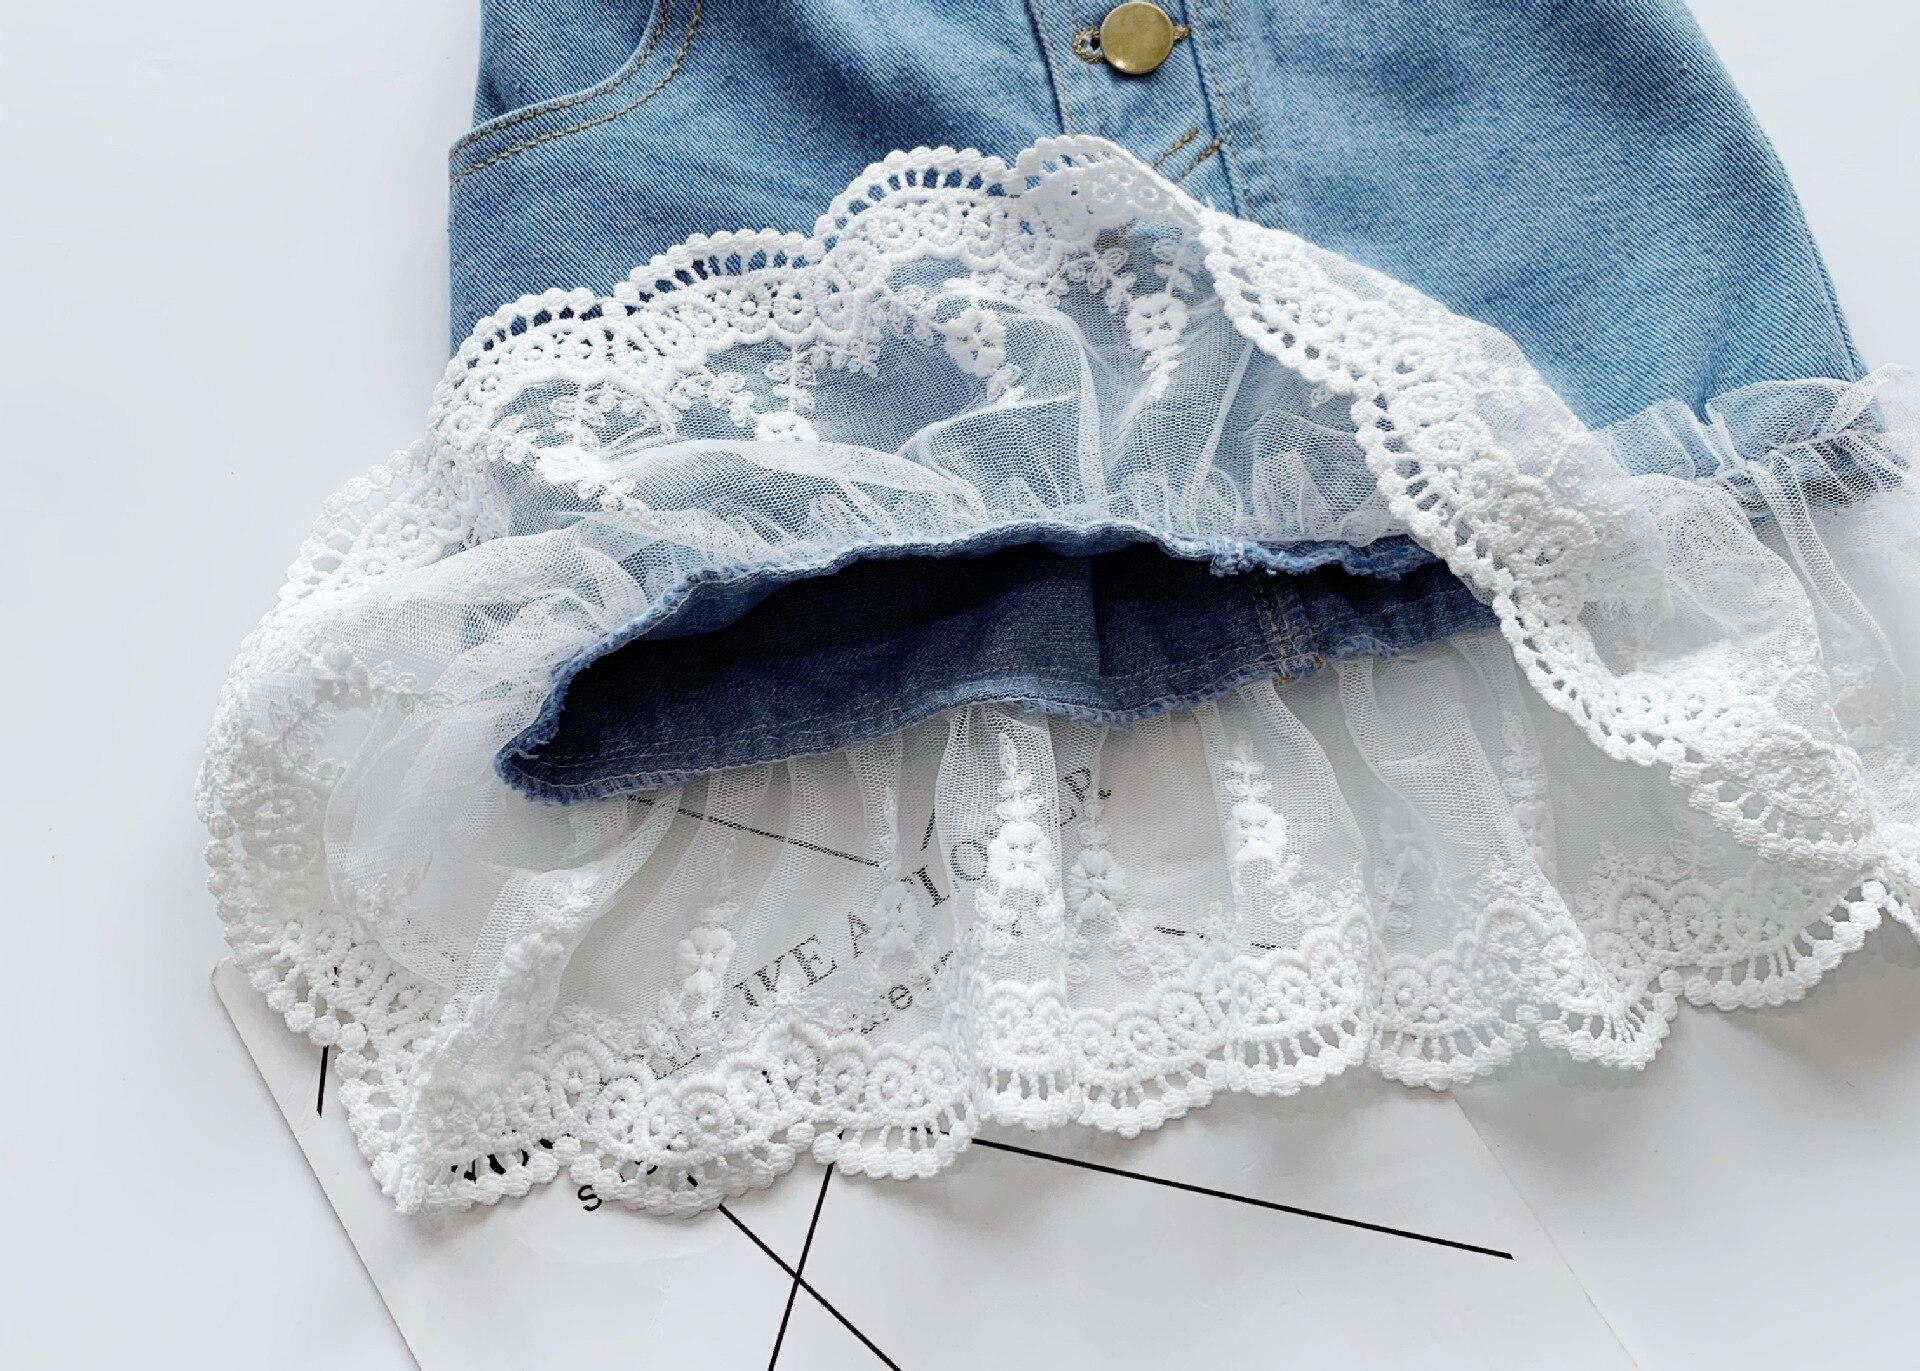 Jargazol Fashion Kids Clothes Puff Sleeve Shirt&lace Denim Skirt Korean Summer Little Girls Clothing Set Cute Children Outfits 5